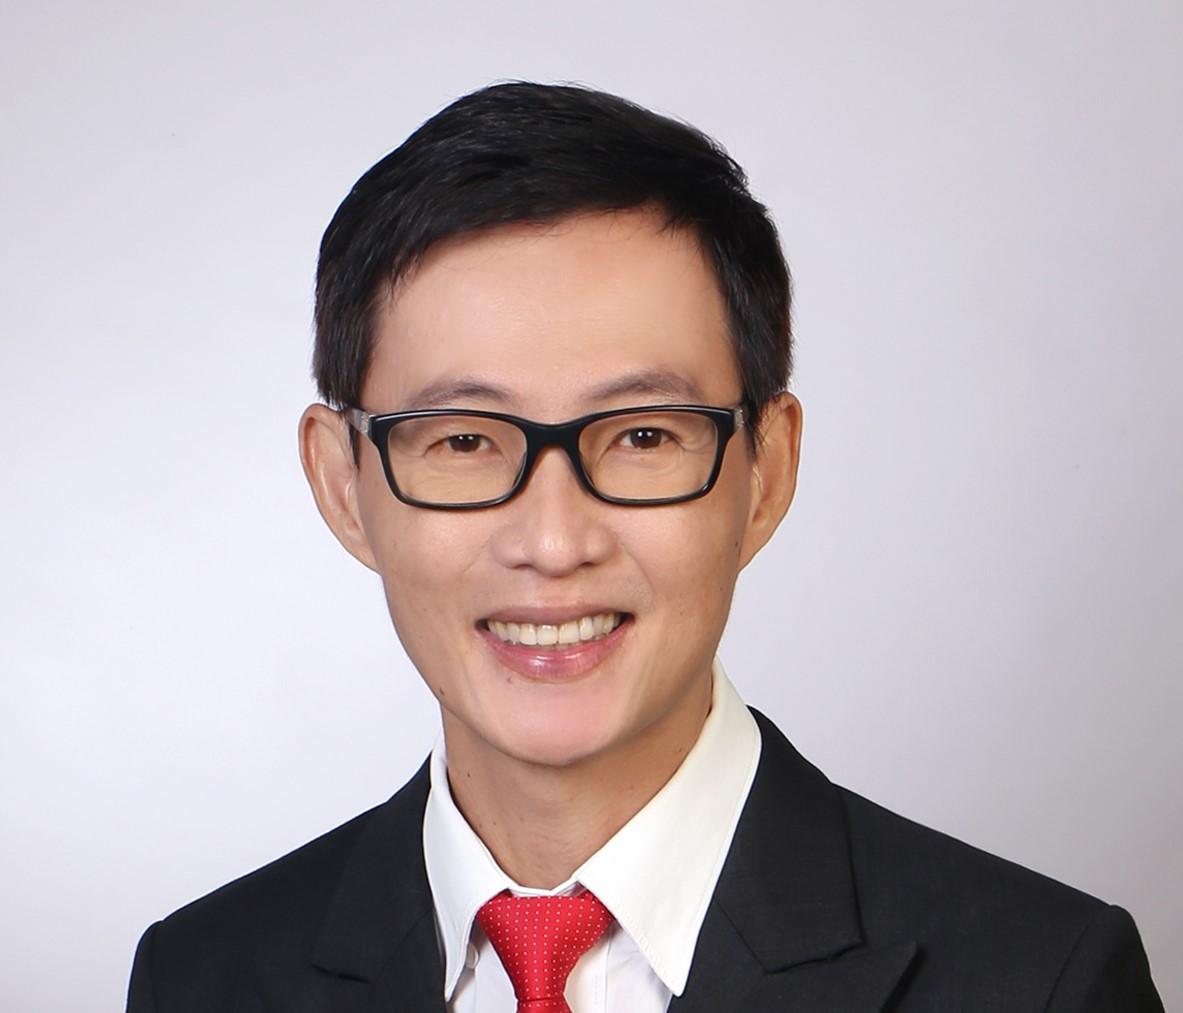 CHAN Beng Kiat